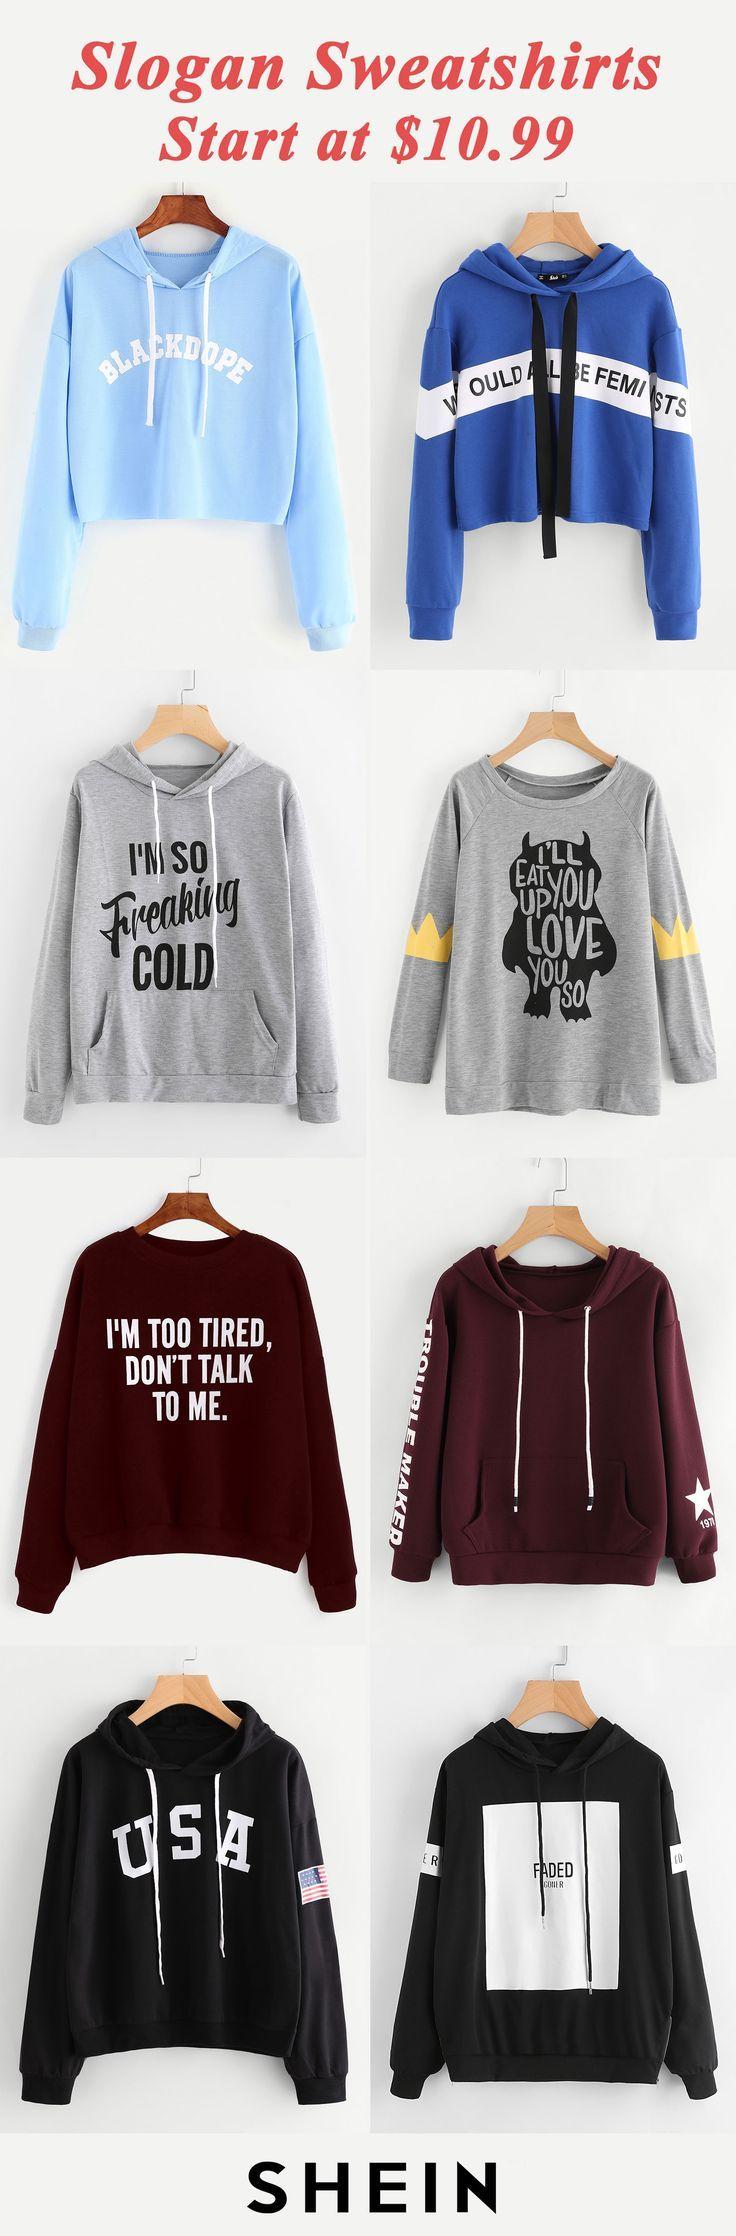 Slogan sweatshirts start at $10.99